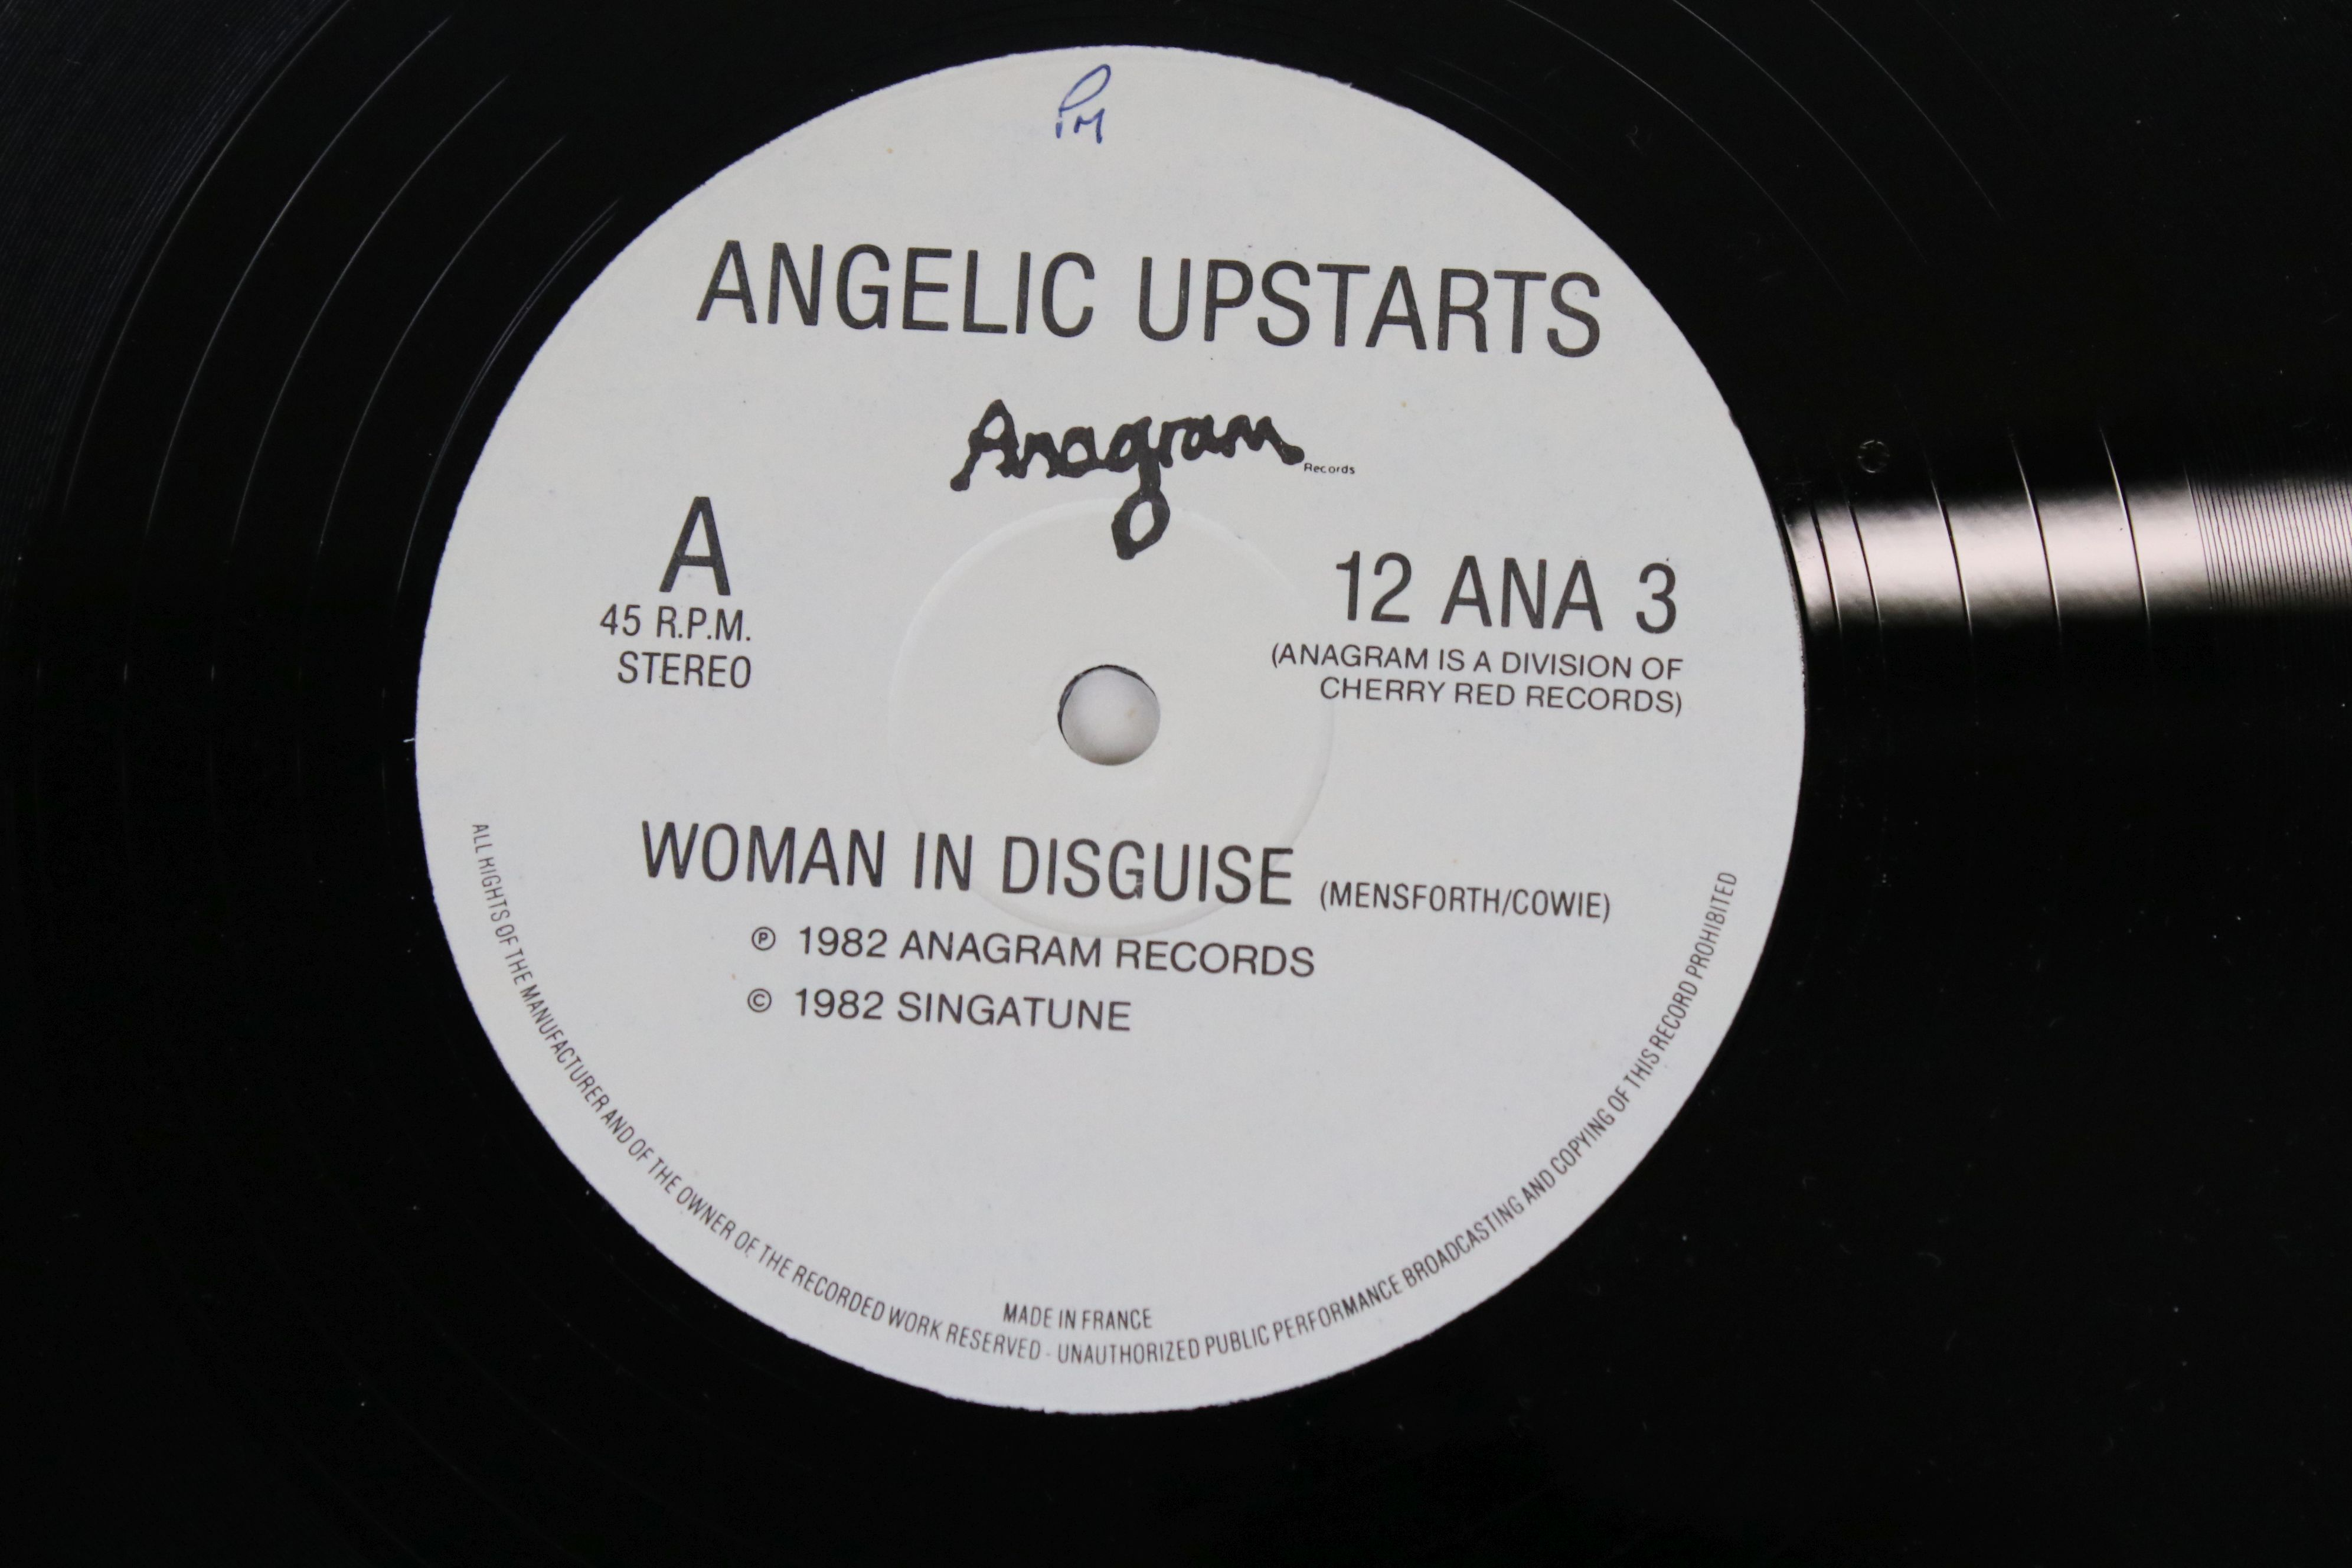 "Vinyl - Punk - Angelic Upstarts - Reason Why? LP plus 2 x 12"" singles (Solidarity & Woman In - Image 5 of 5"